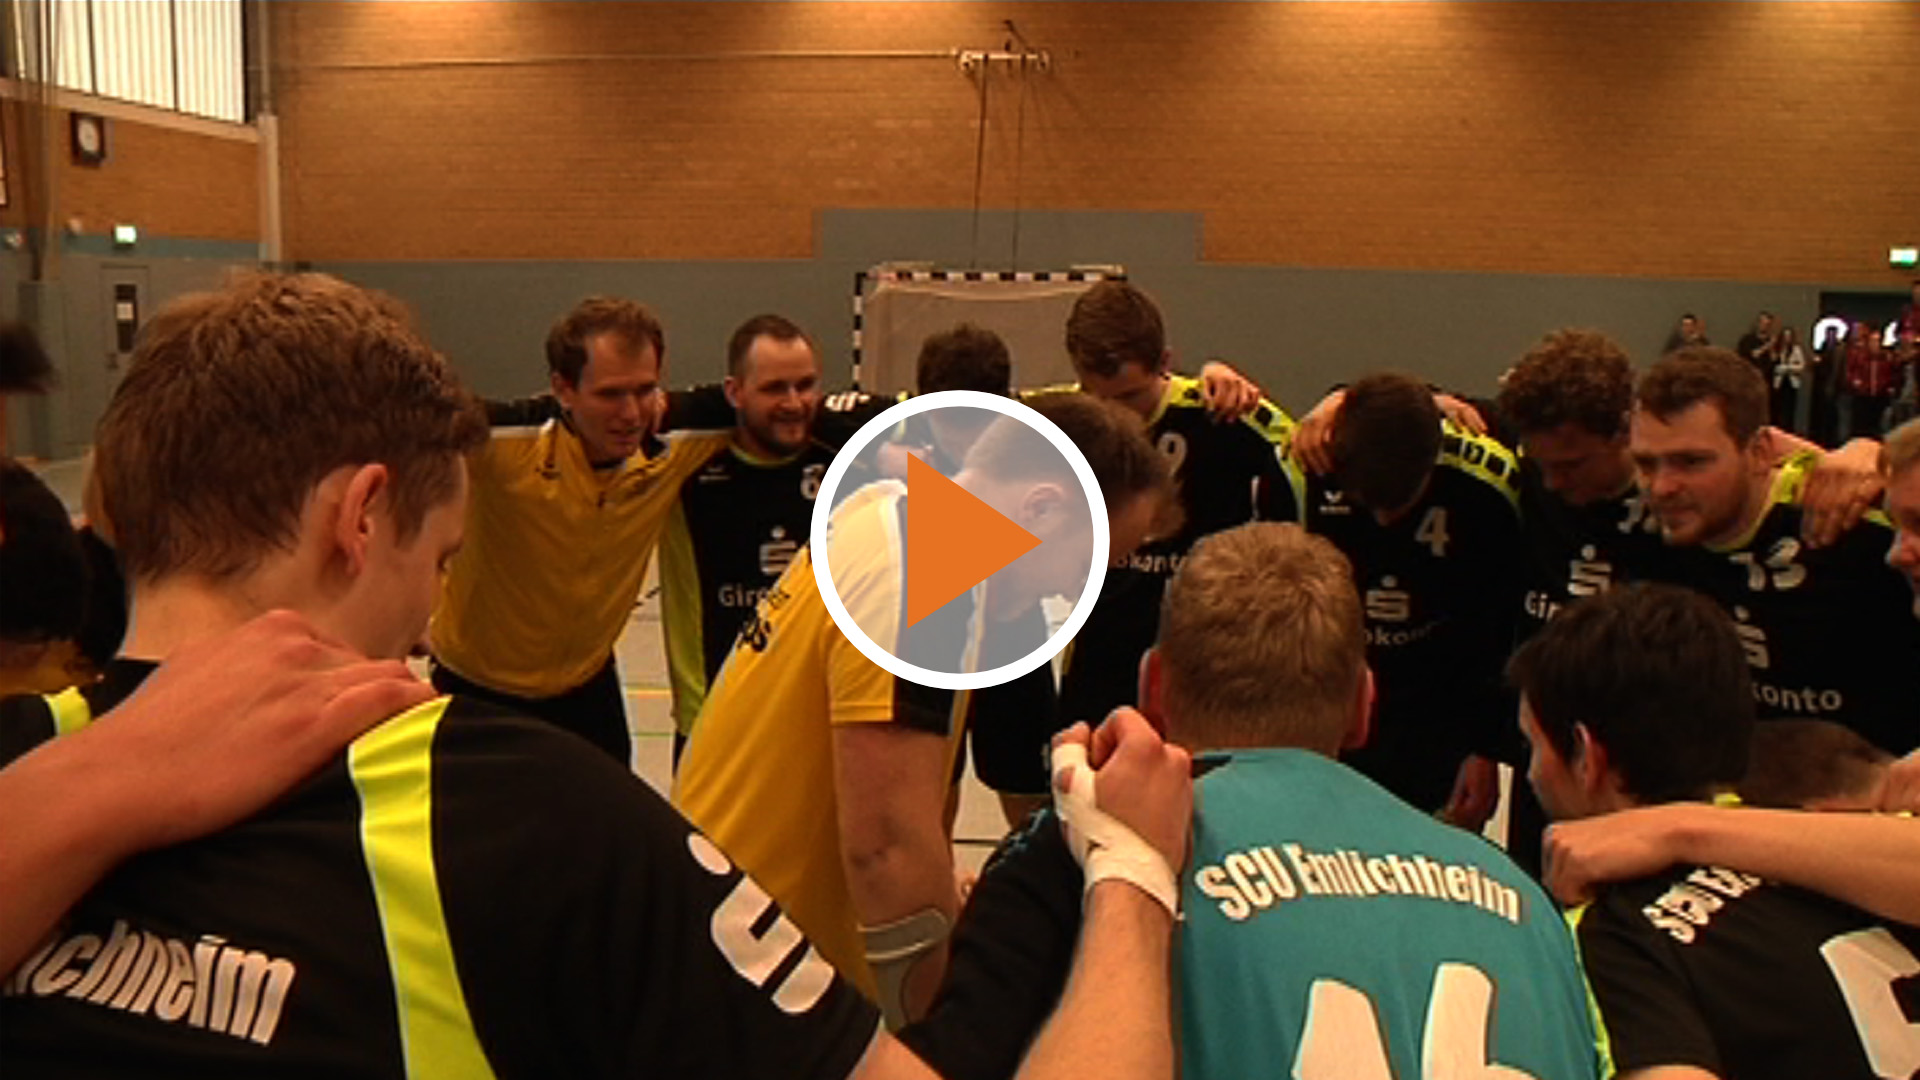 SCREEN_Emlichheim Handball